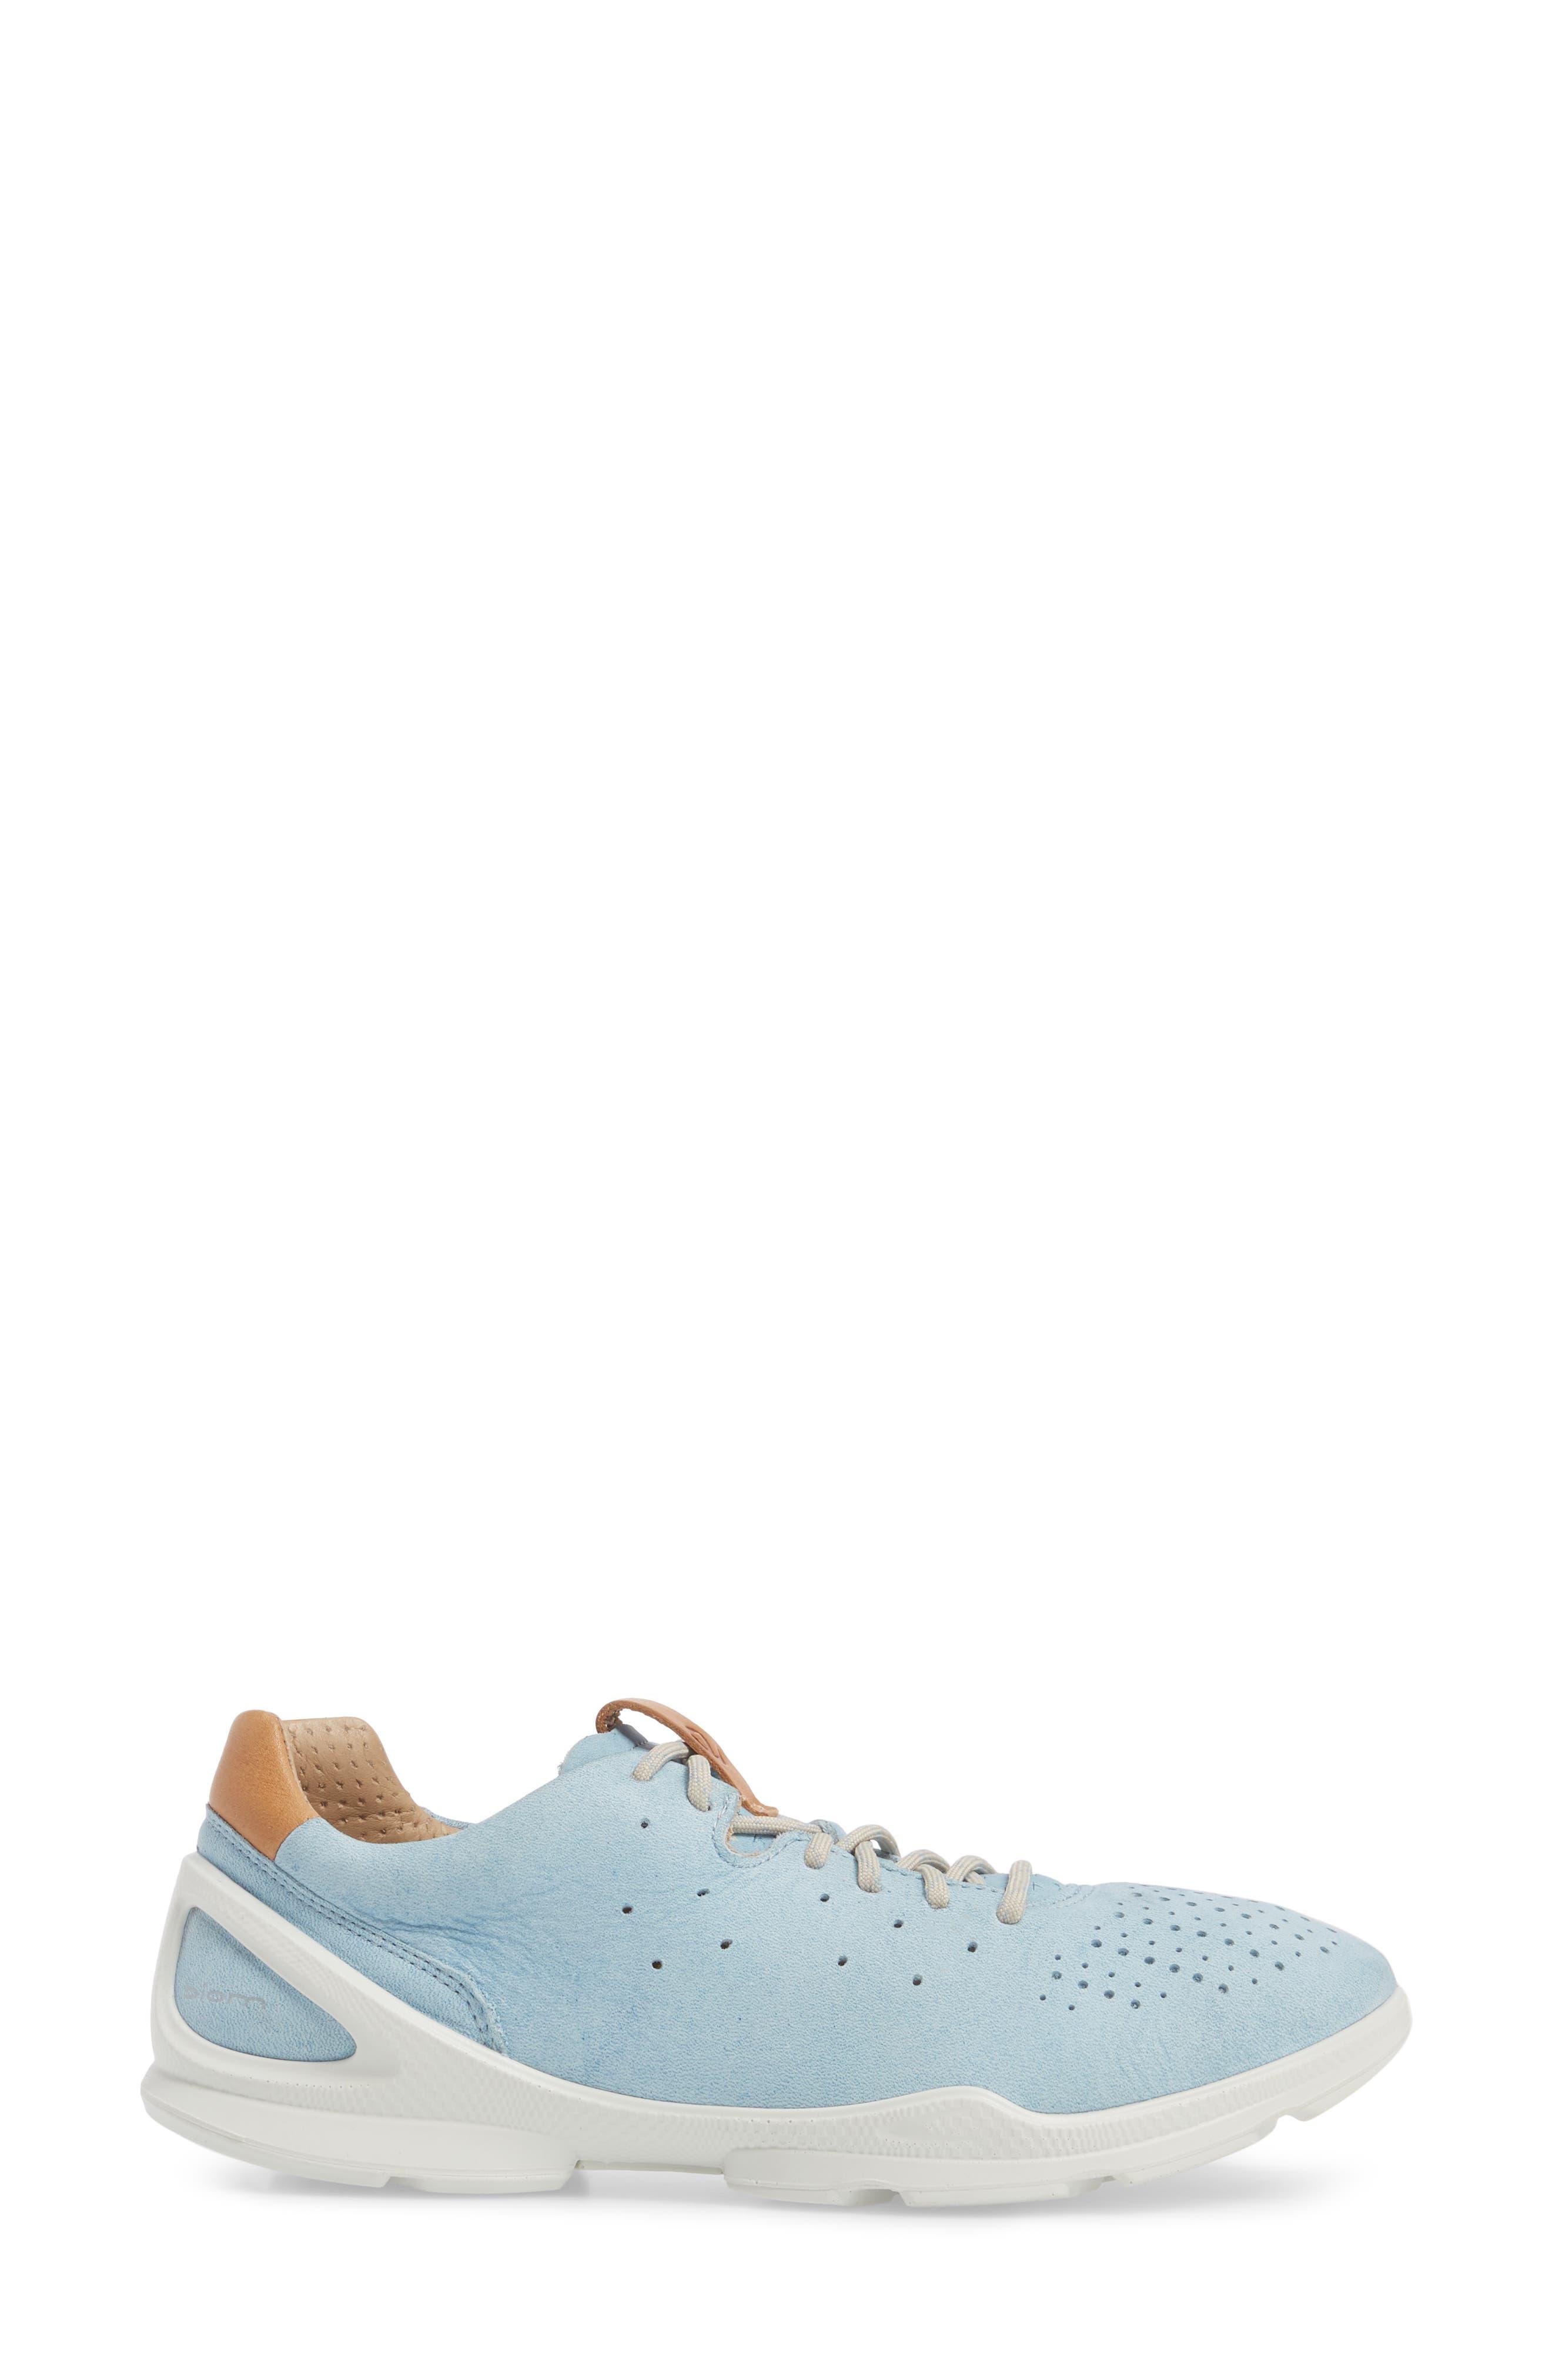 Biom Street Sneaker,                             Alternate thumbnail 6, color,